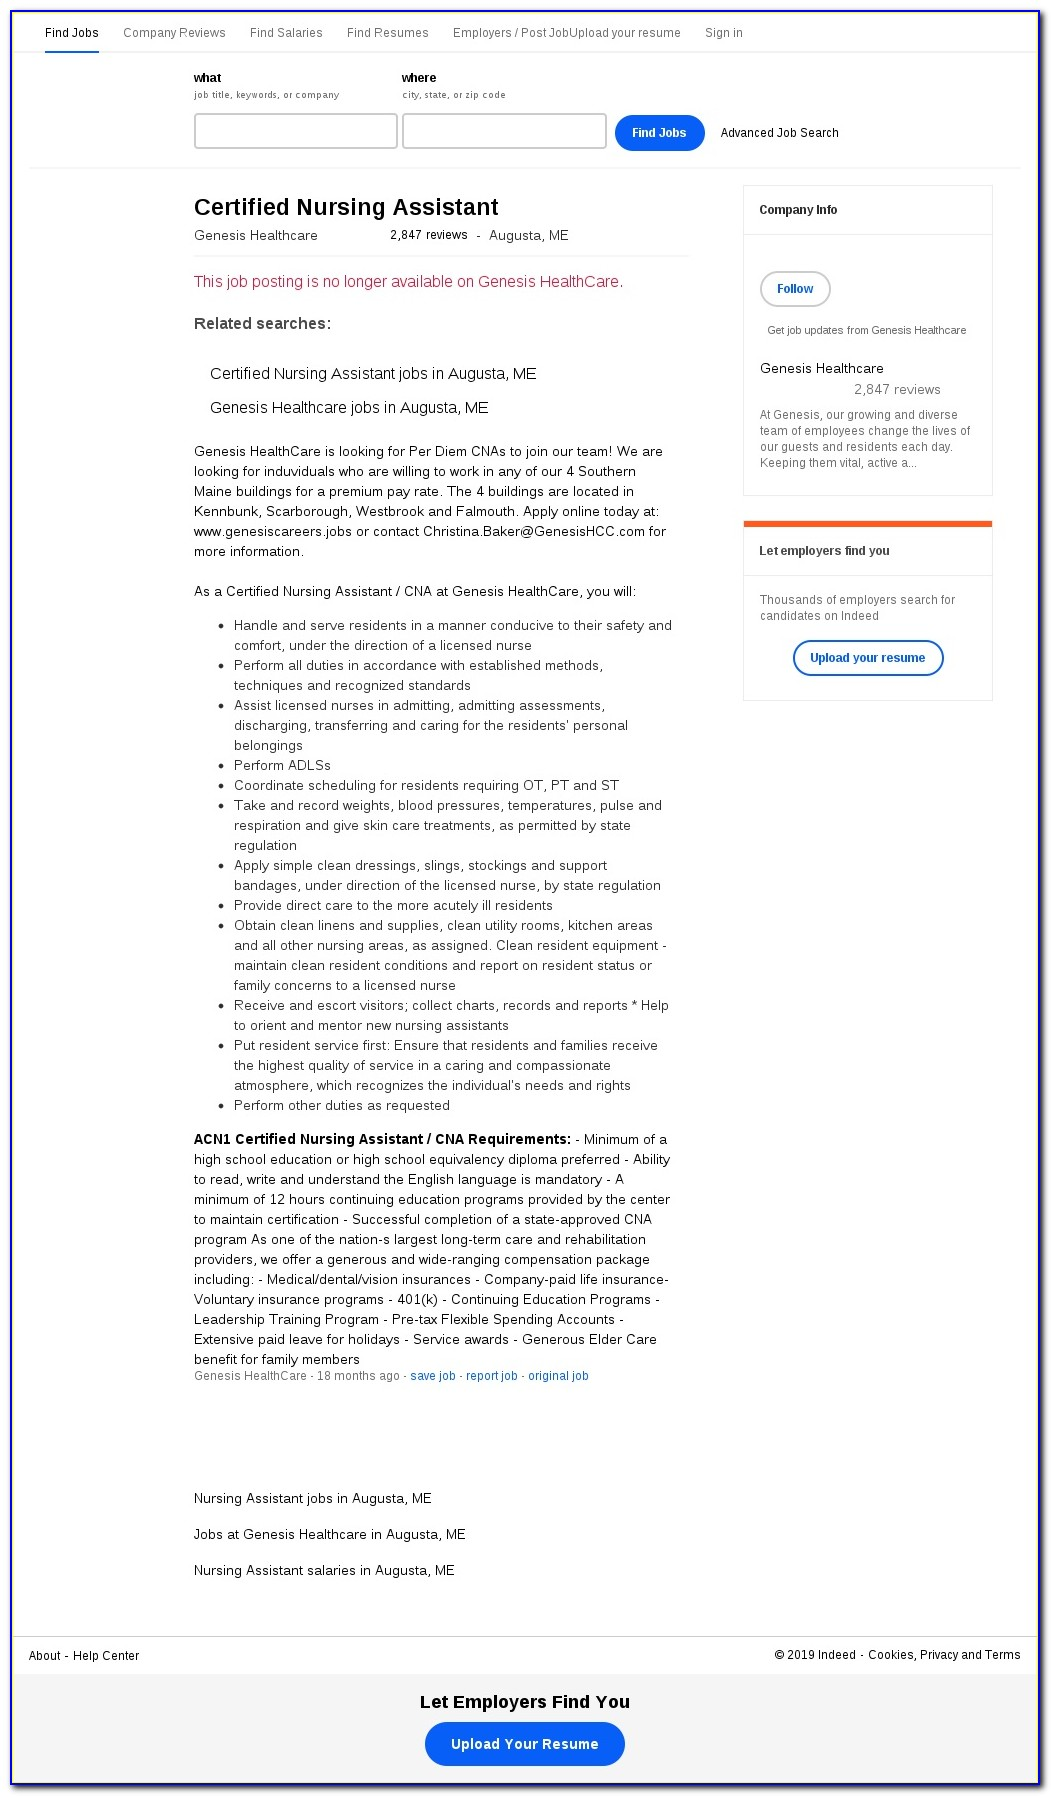 Genesis Healthcare Job Application Form